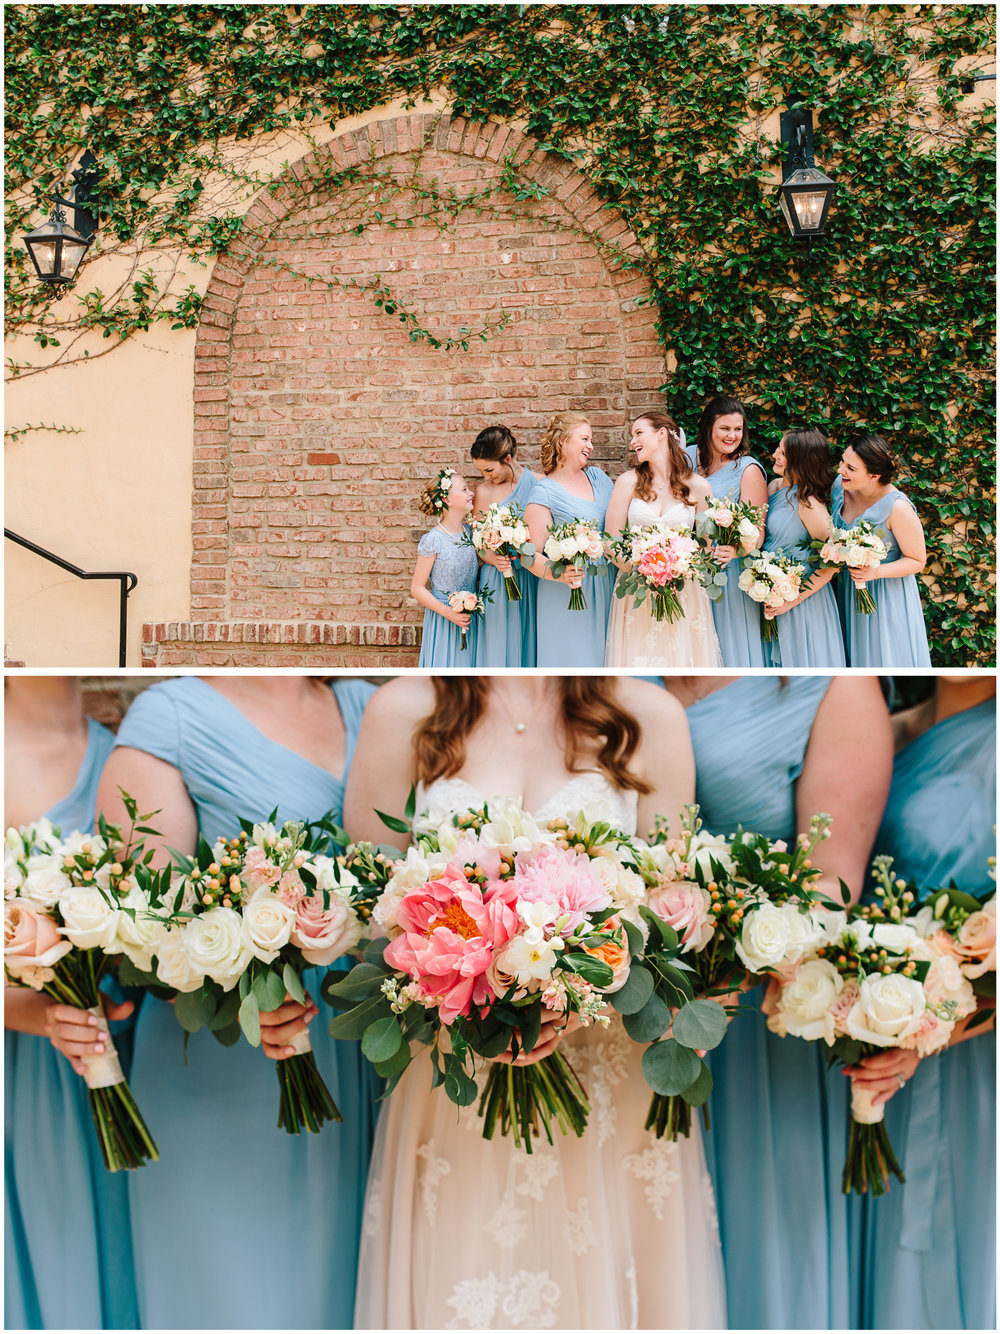 bella_collina_wedding_49a.jpg